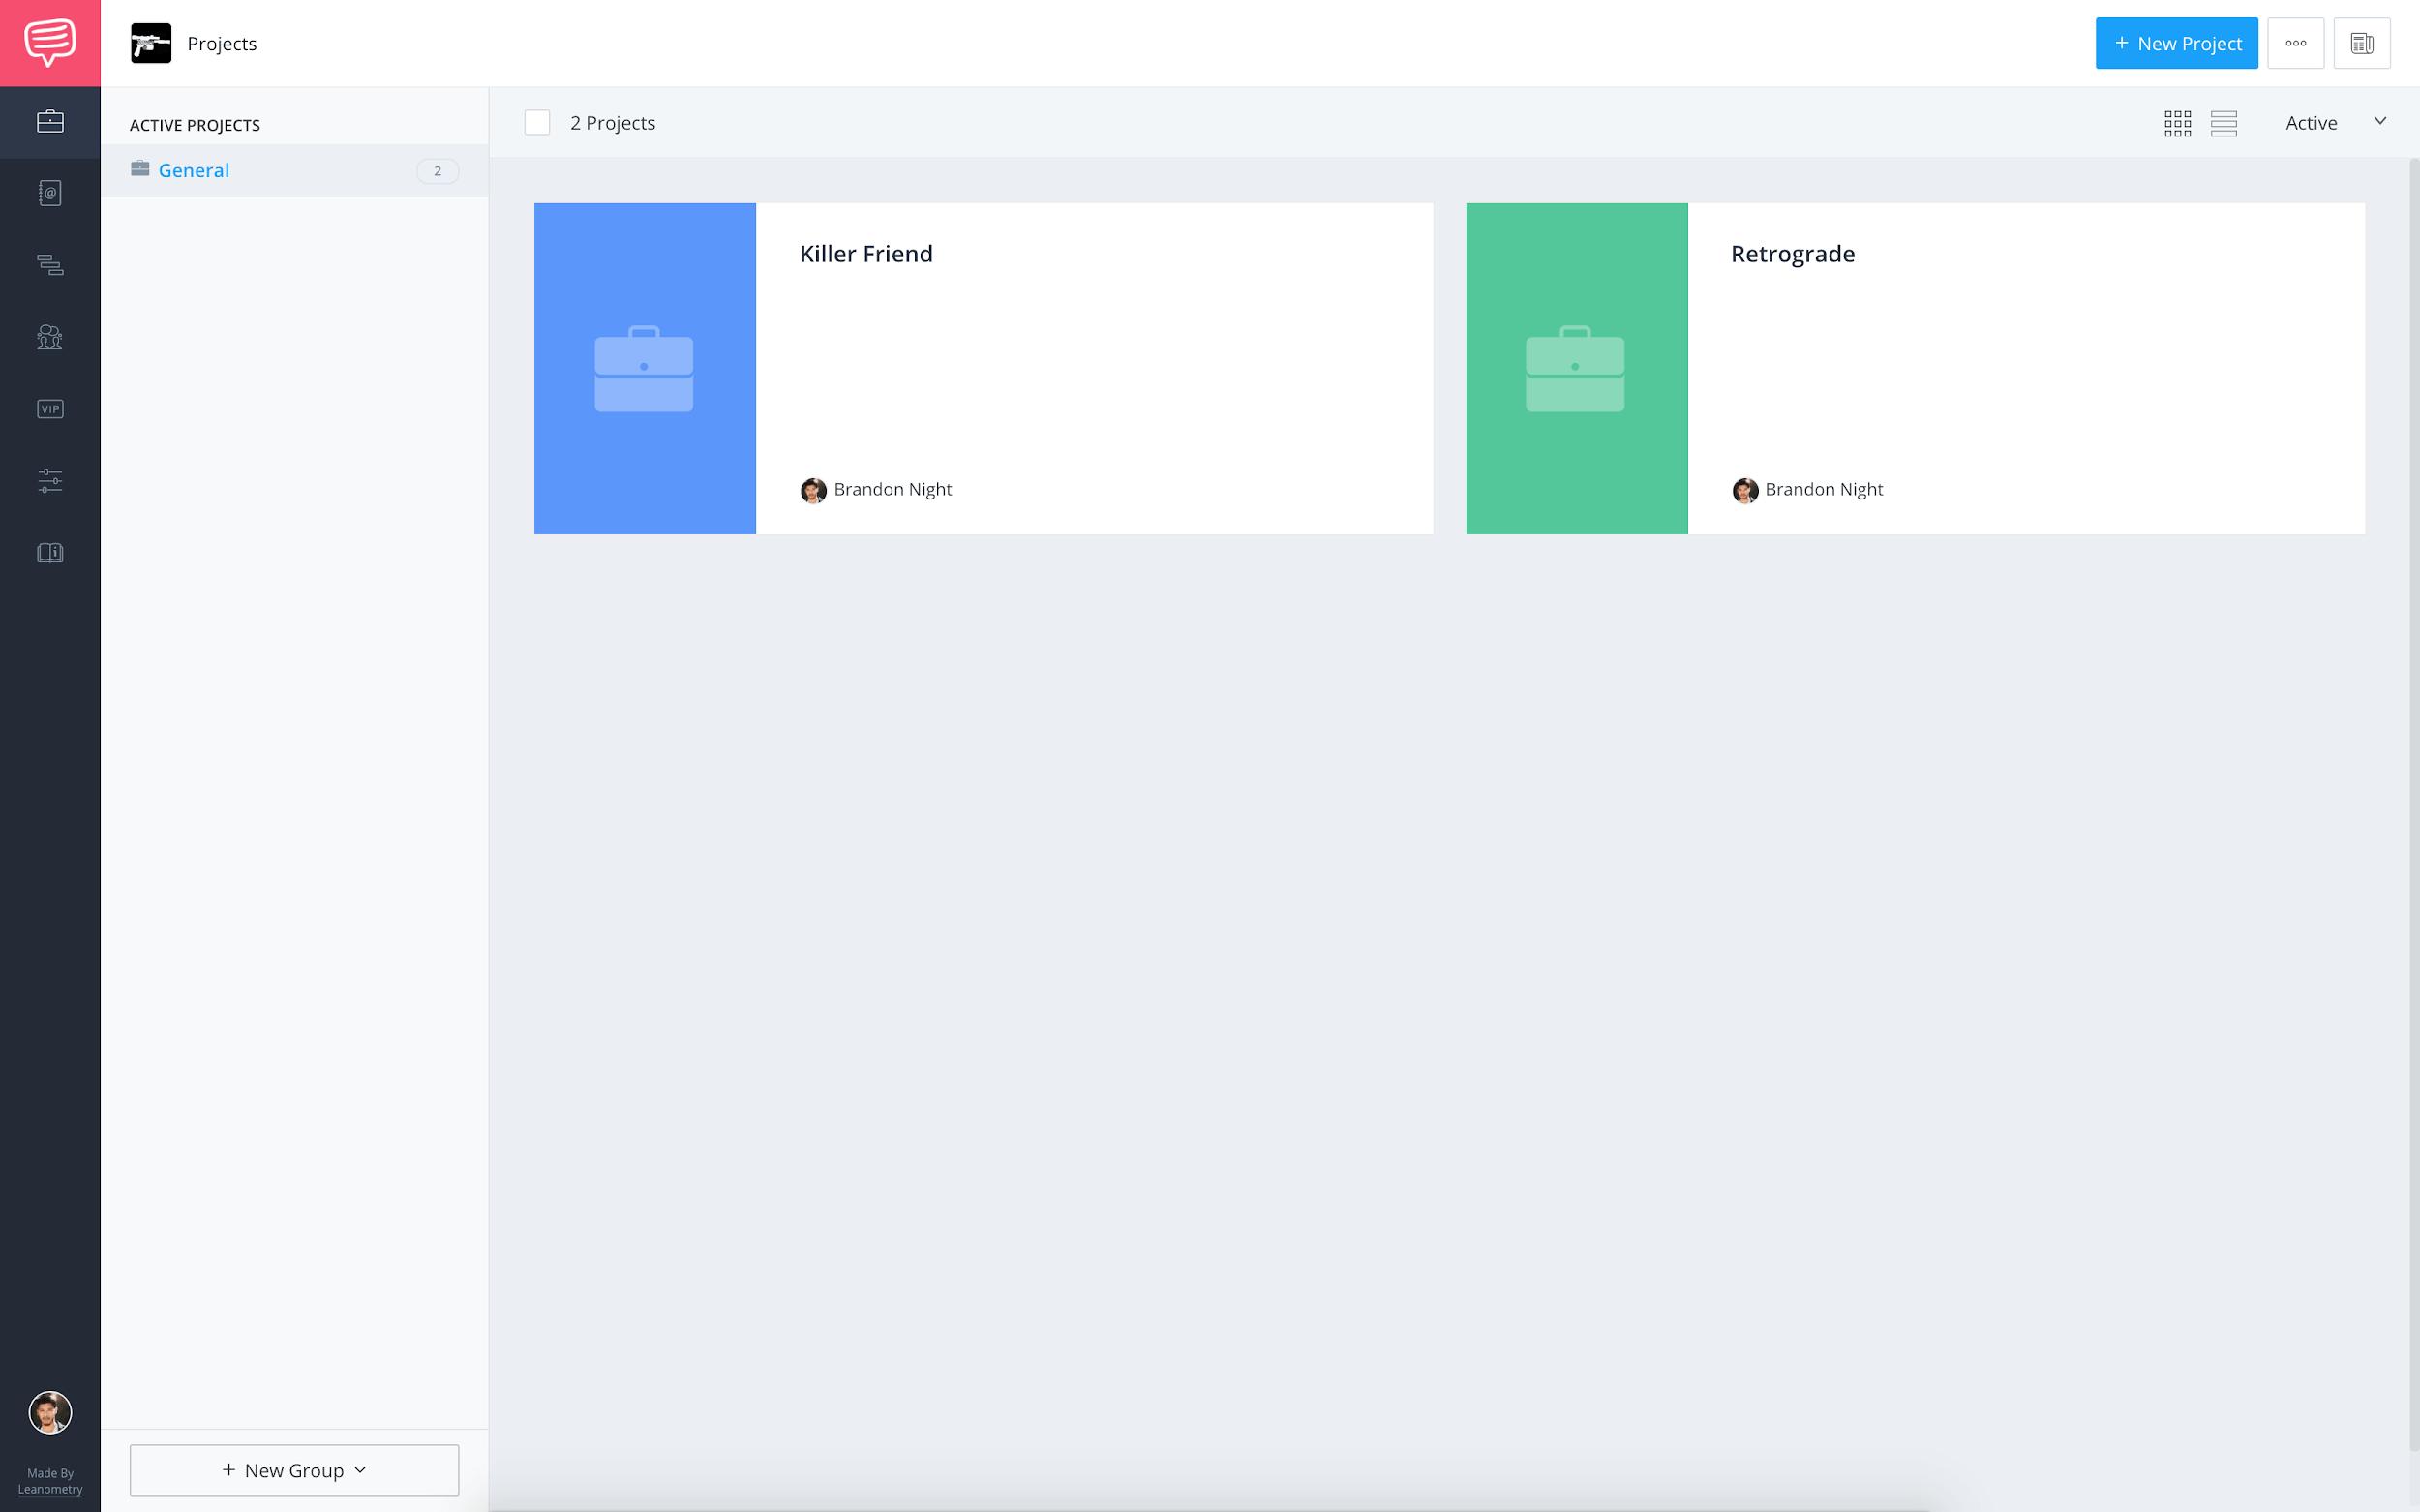 StudioBinder - Account dashboard